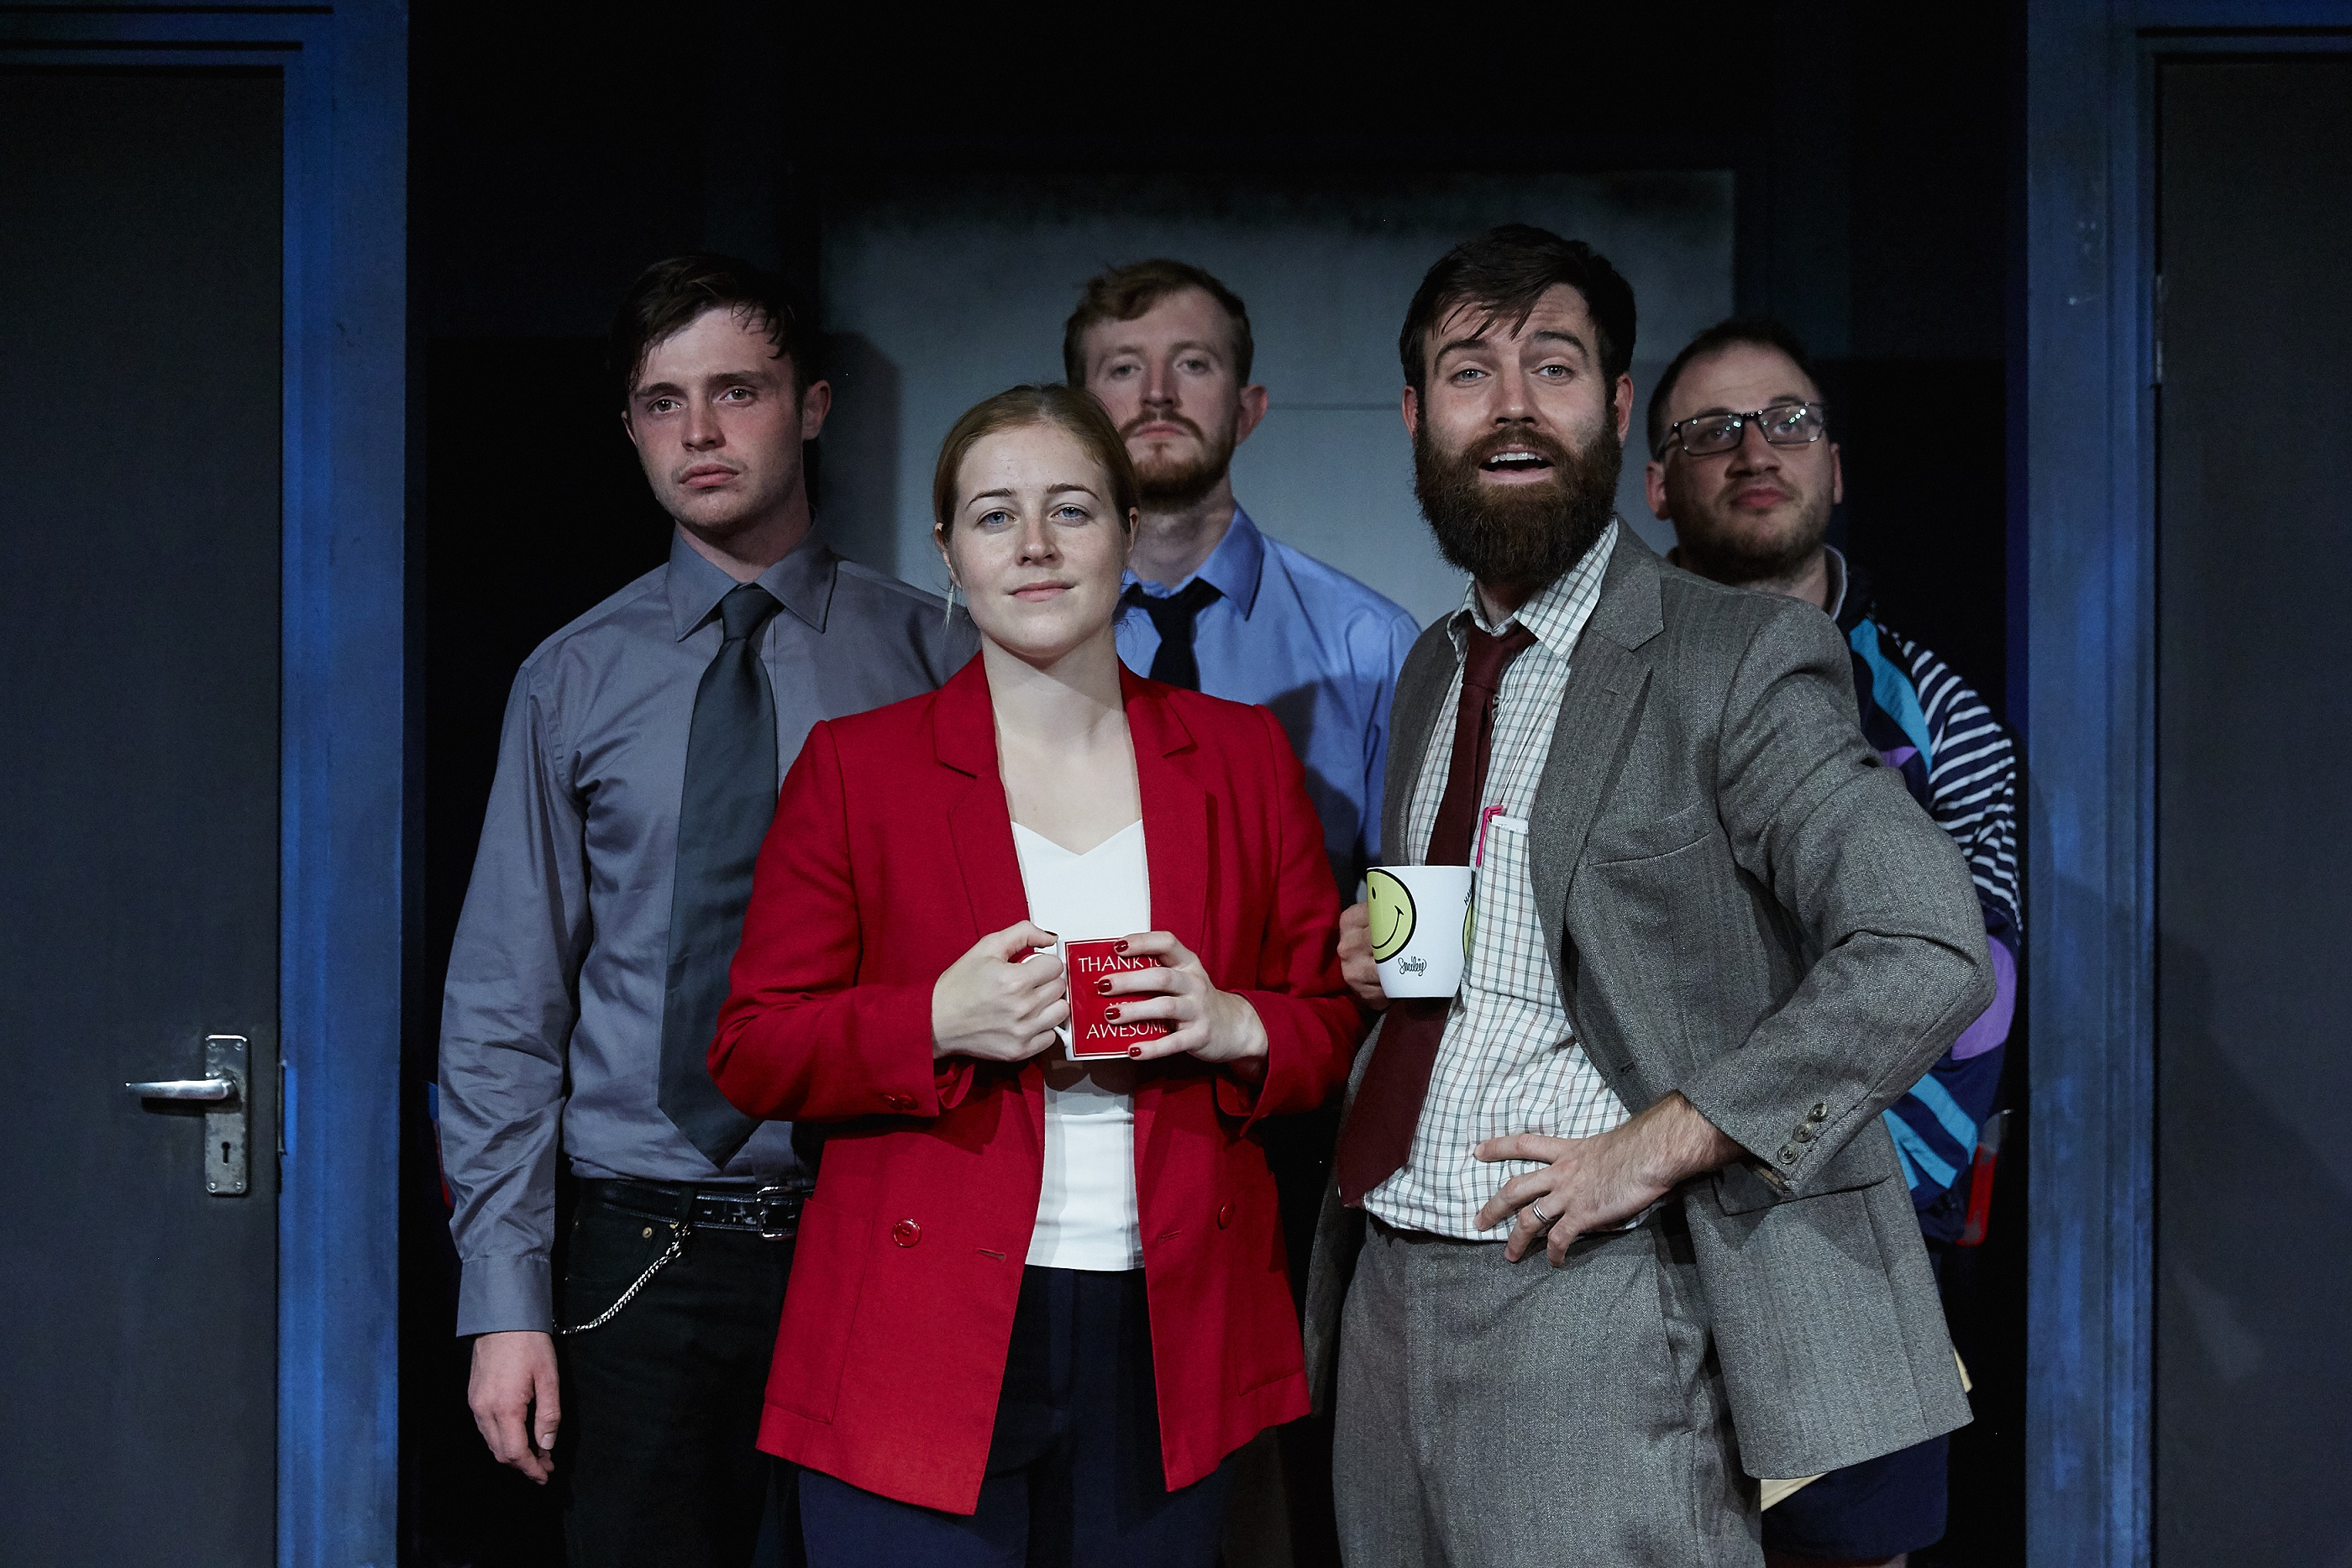 The-cast-of-The-Wardrobe-Ensembles-Education-Education-Education-at-Pleasance-Edinburgh-Fringe_Credit-The-Other-Richard